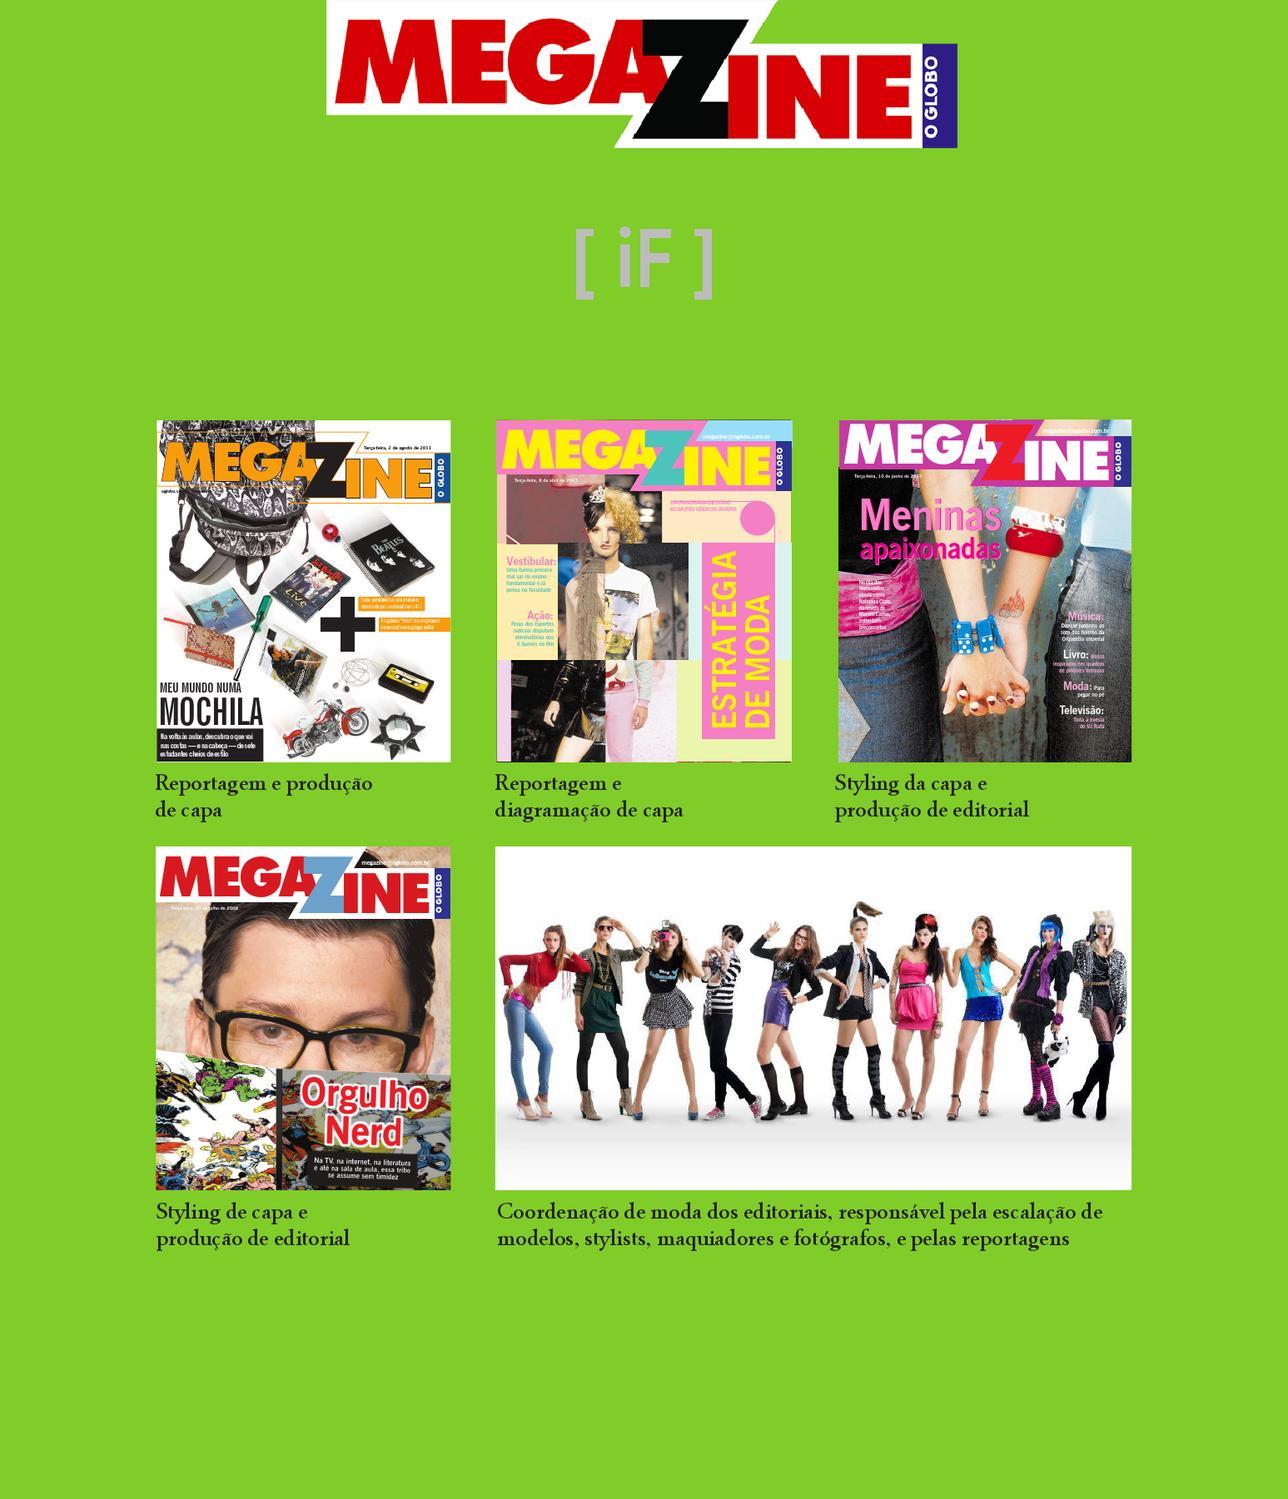 d2d88379b85 Revista MEGAZINE by IGOR FIDALGO - issuu